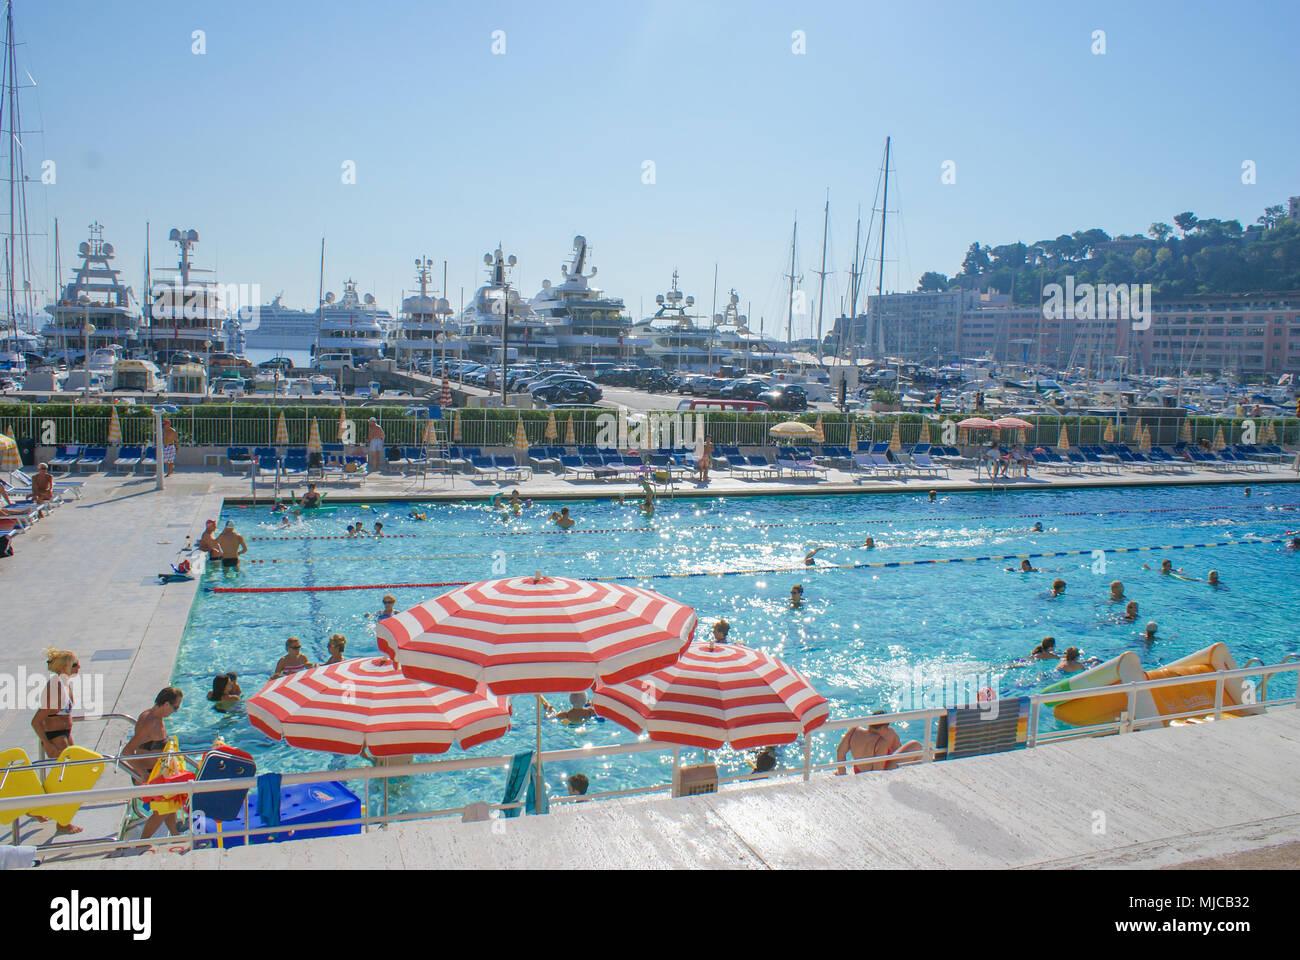 Bathing people in stade nautique Rainier in Monaco, Monte-Carlo Stock Photo